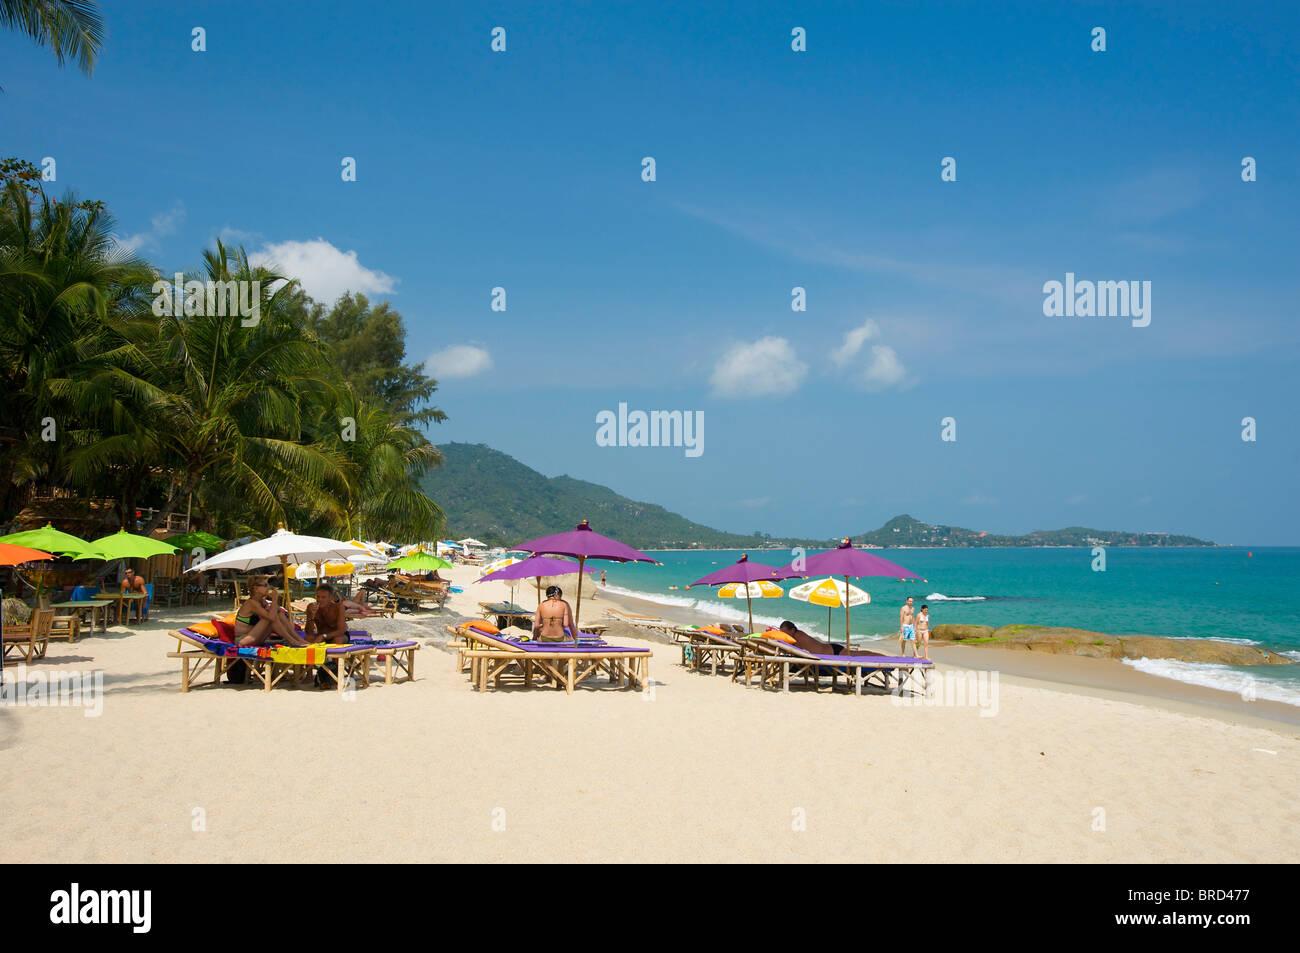 Lamai Beach, Ko Samui Insel, Thailand - Stock Image